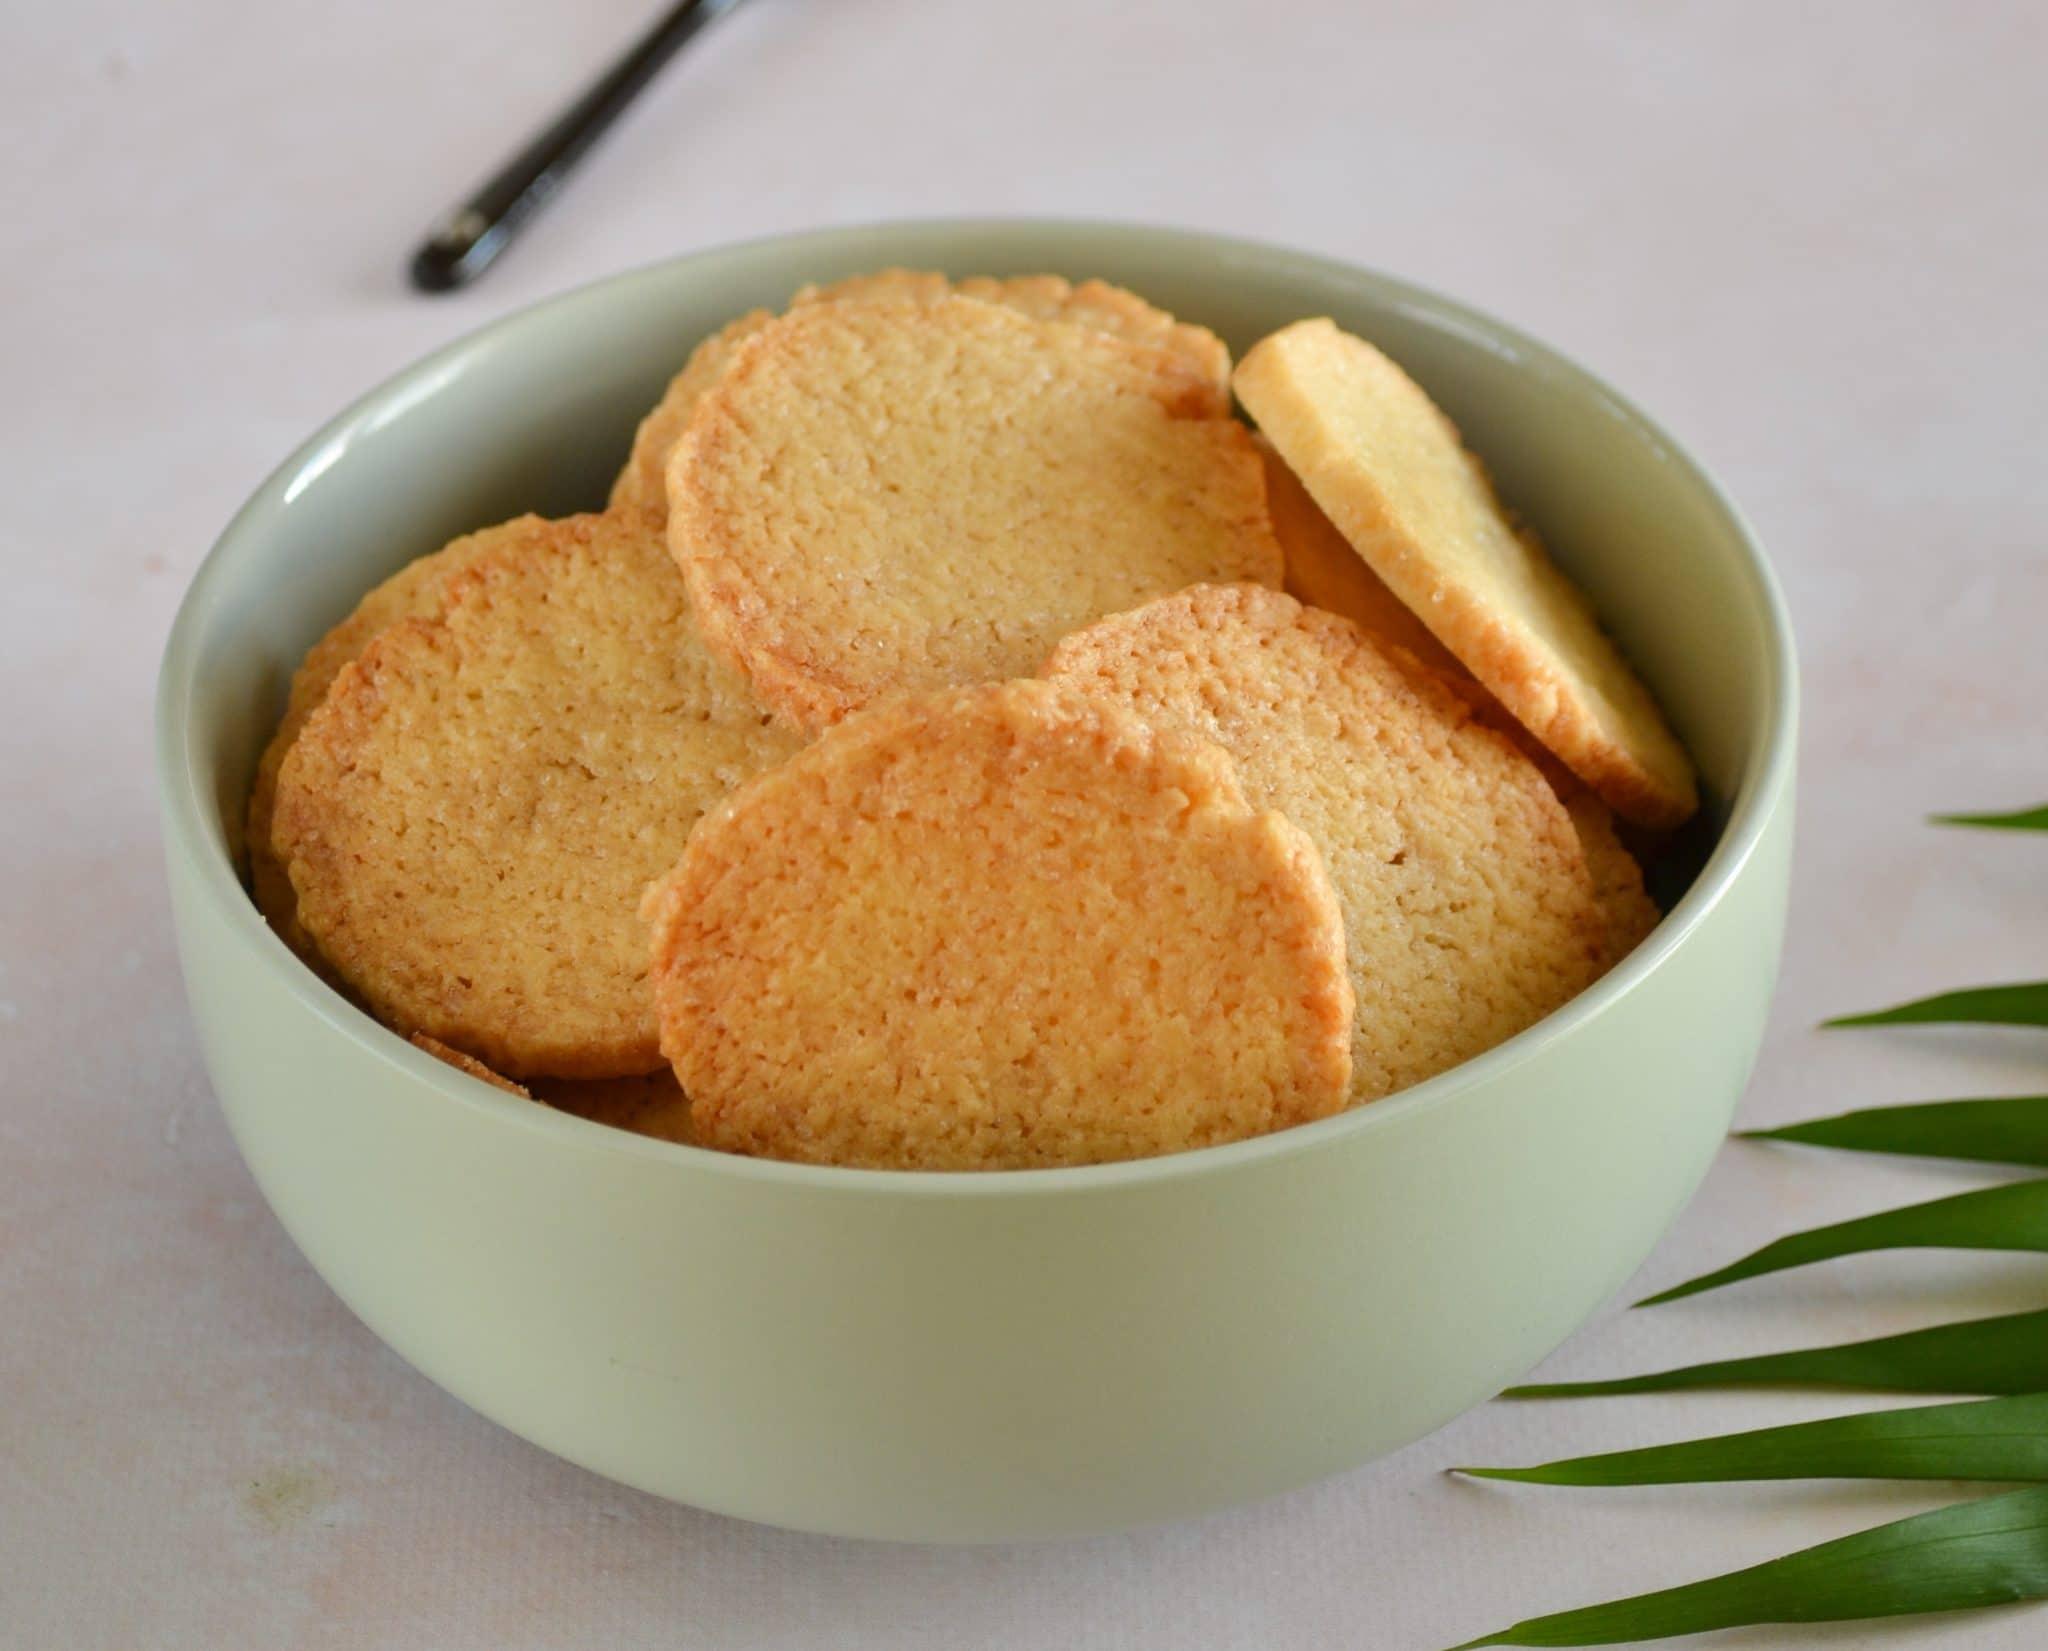 petits biscuits a la creme 1 scaled